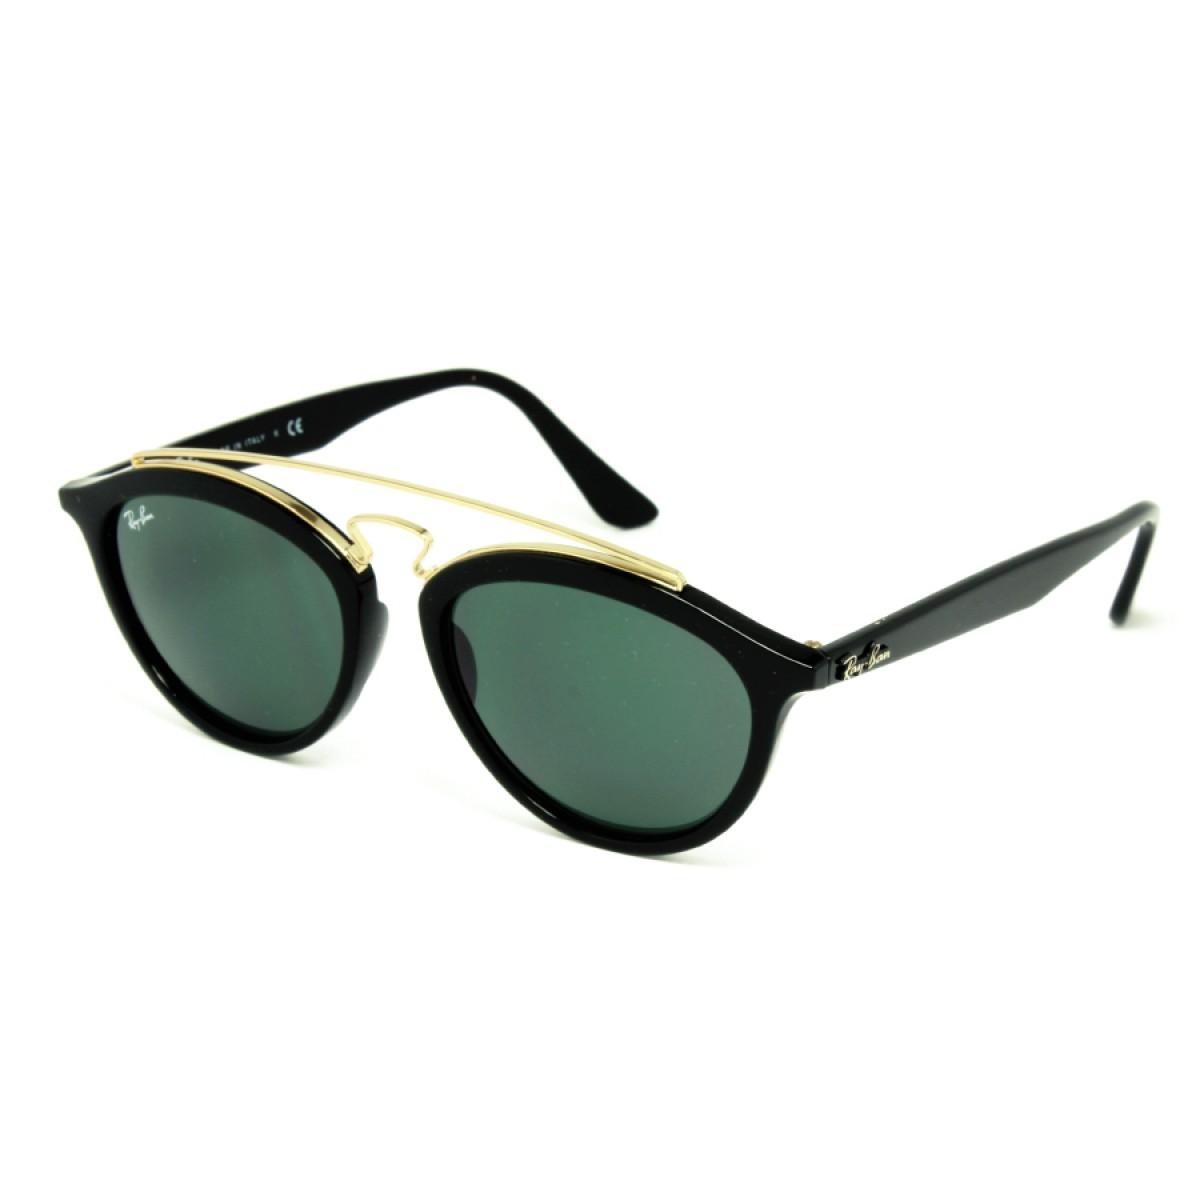 96fb720bf1 Ray Ban Gatsby II Green Classic Unisex Sunglasses RB4257-601 71-50 -  Fashion World